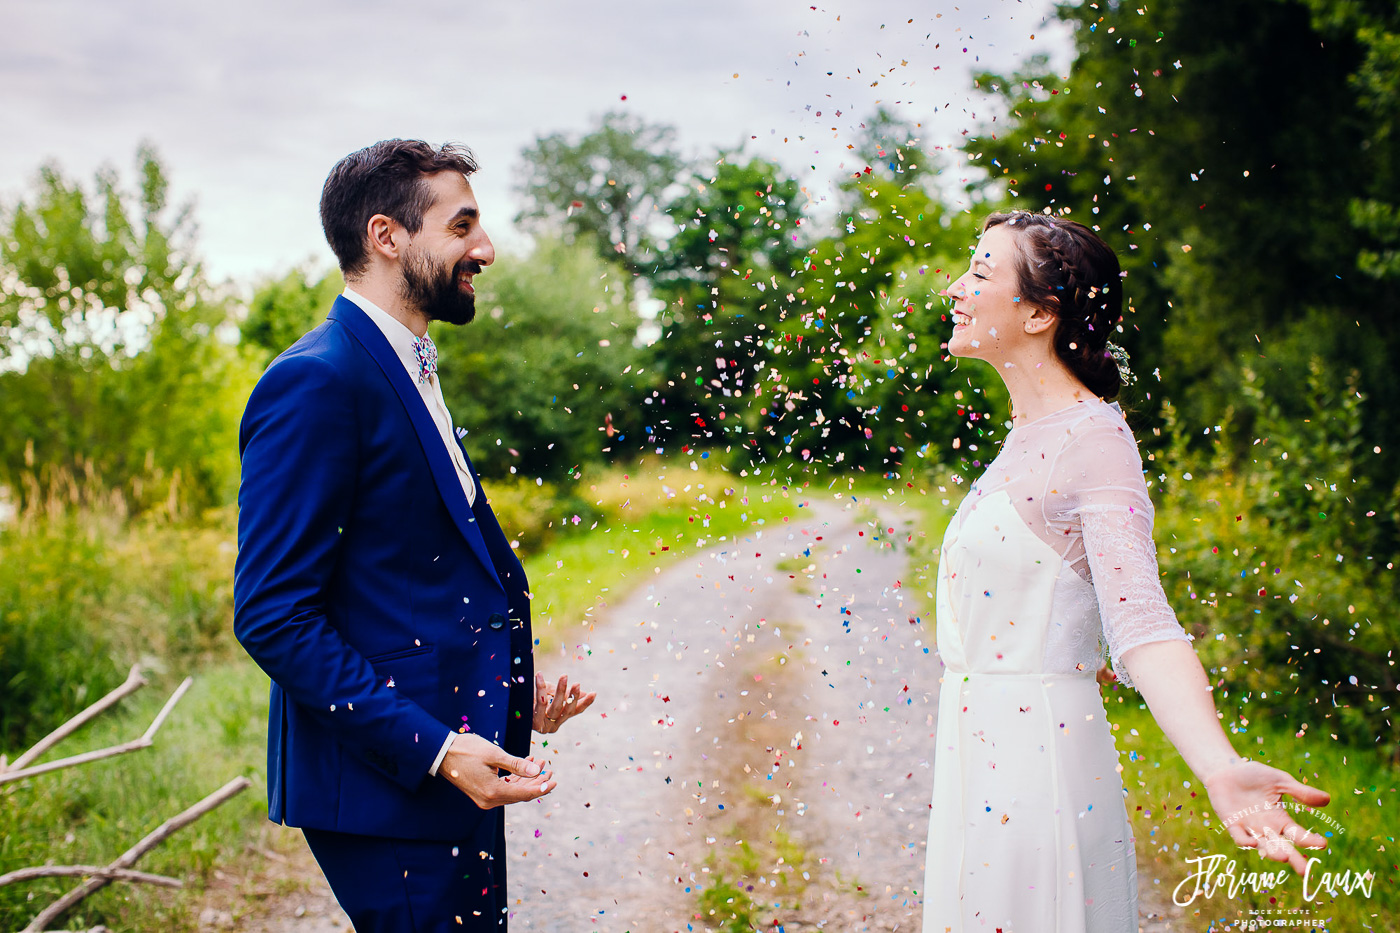 photographe-mariage-pays-basque-Floriane-Caux (49)